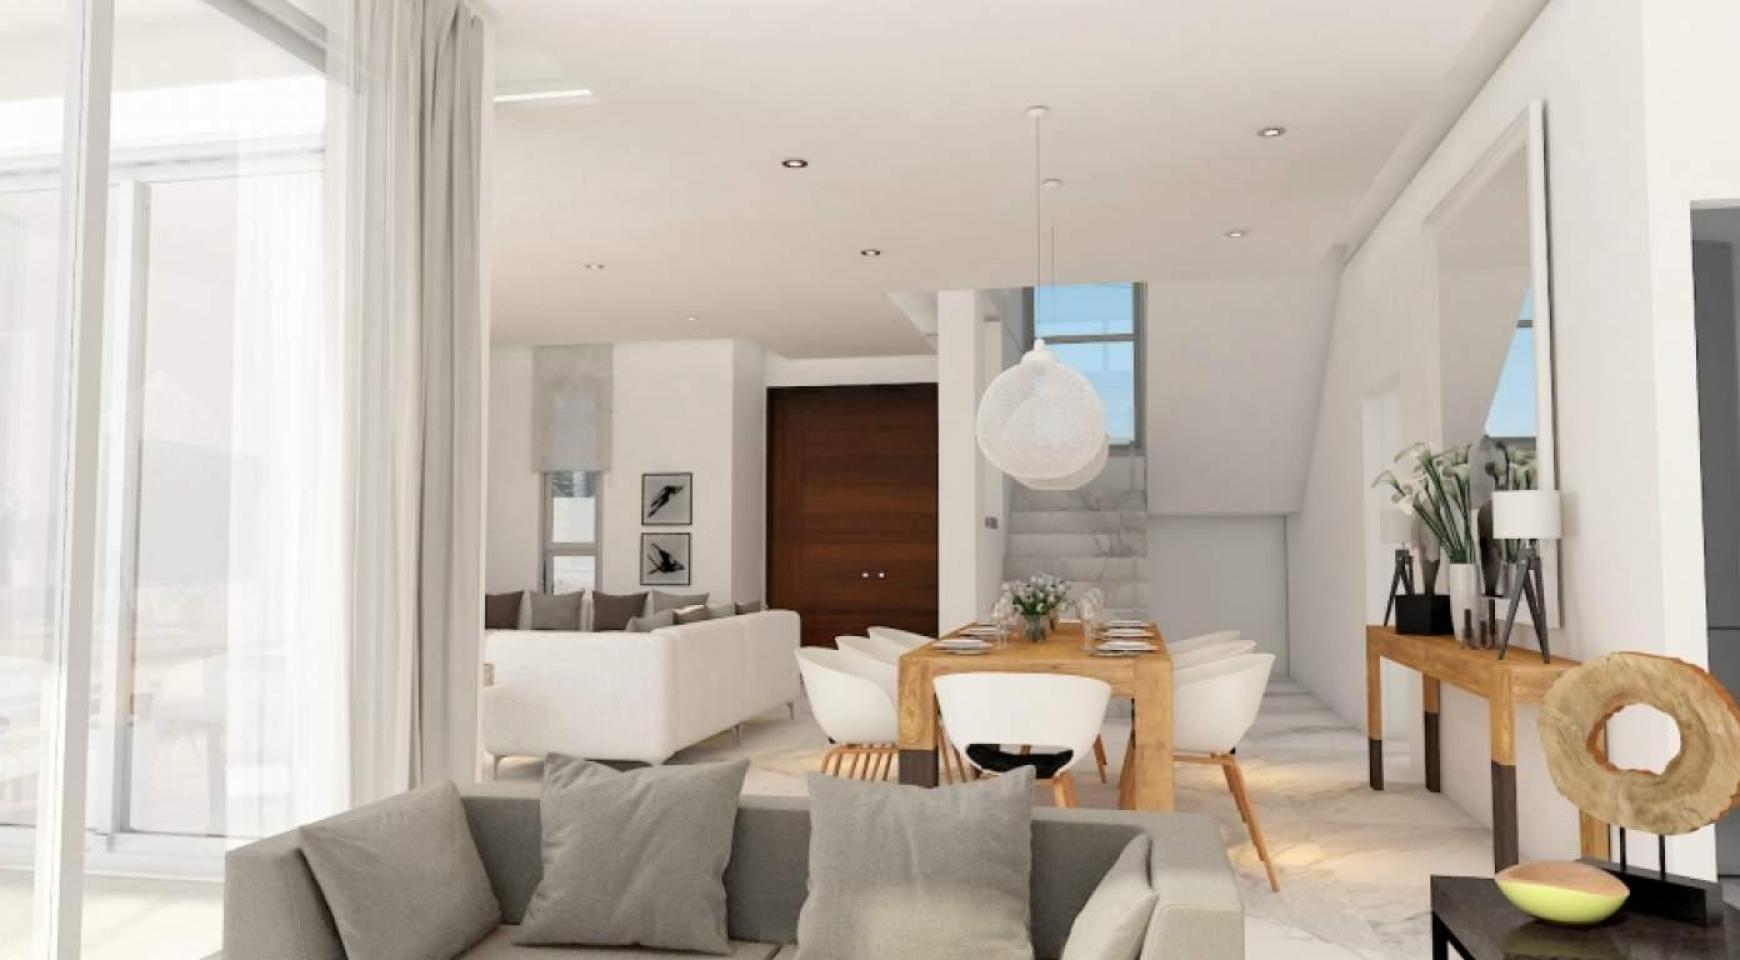 Contemporary Beachfront Villa with 5 Bedrooms - 13